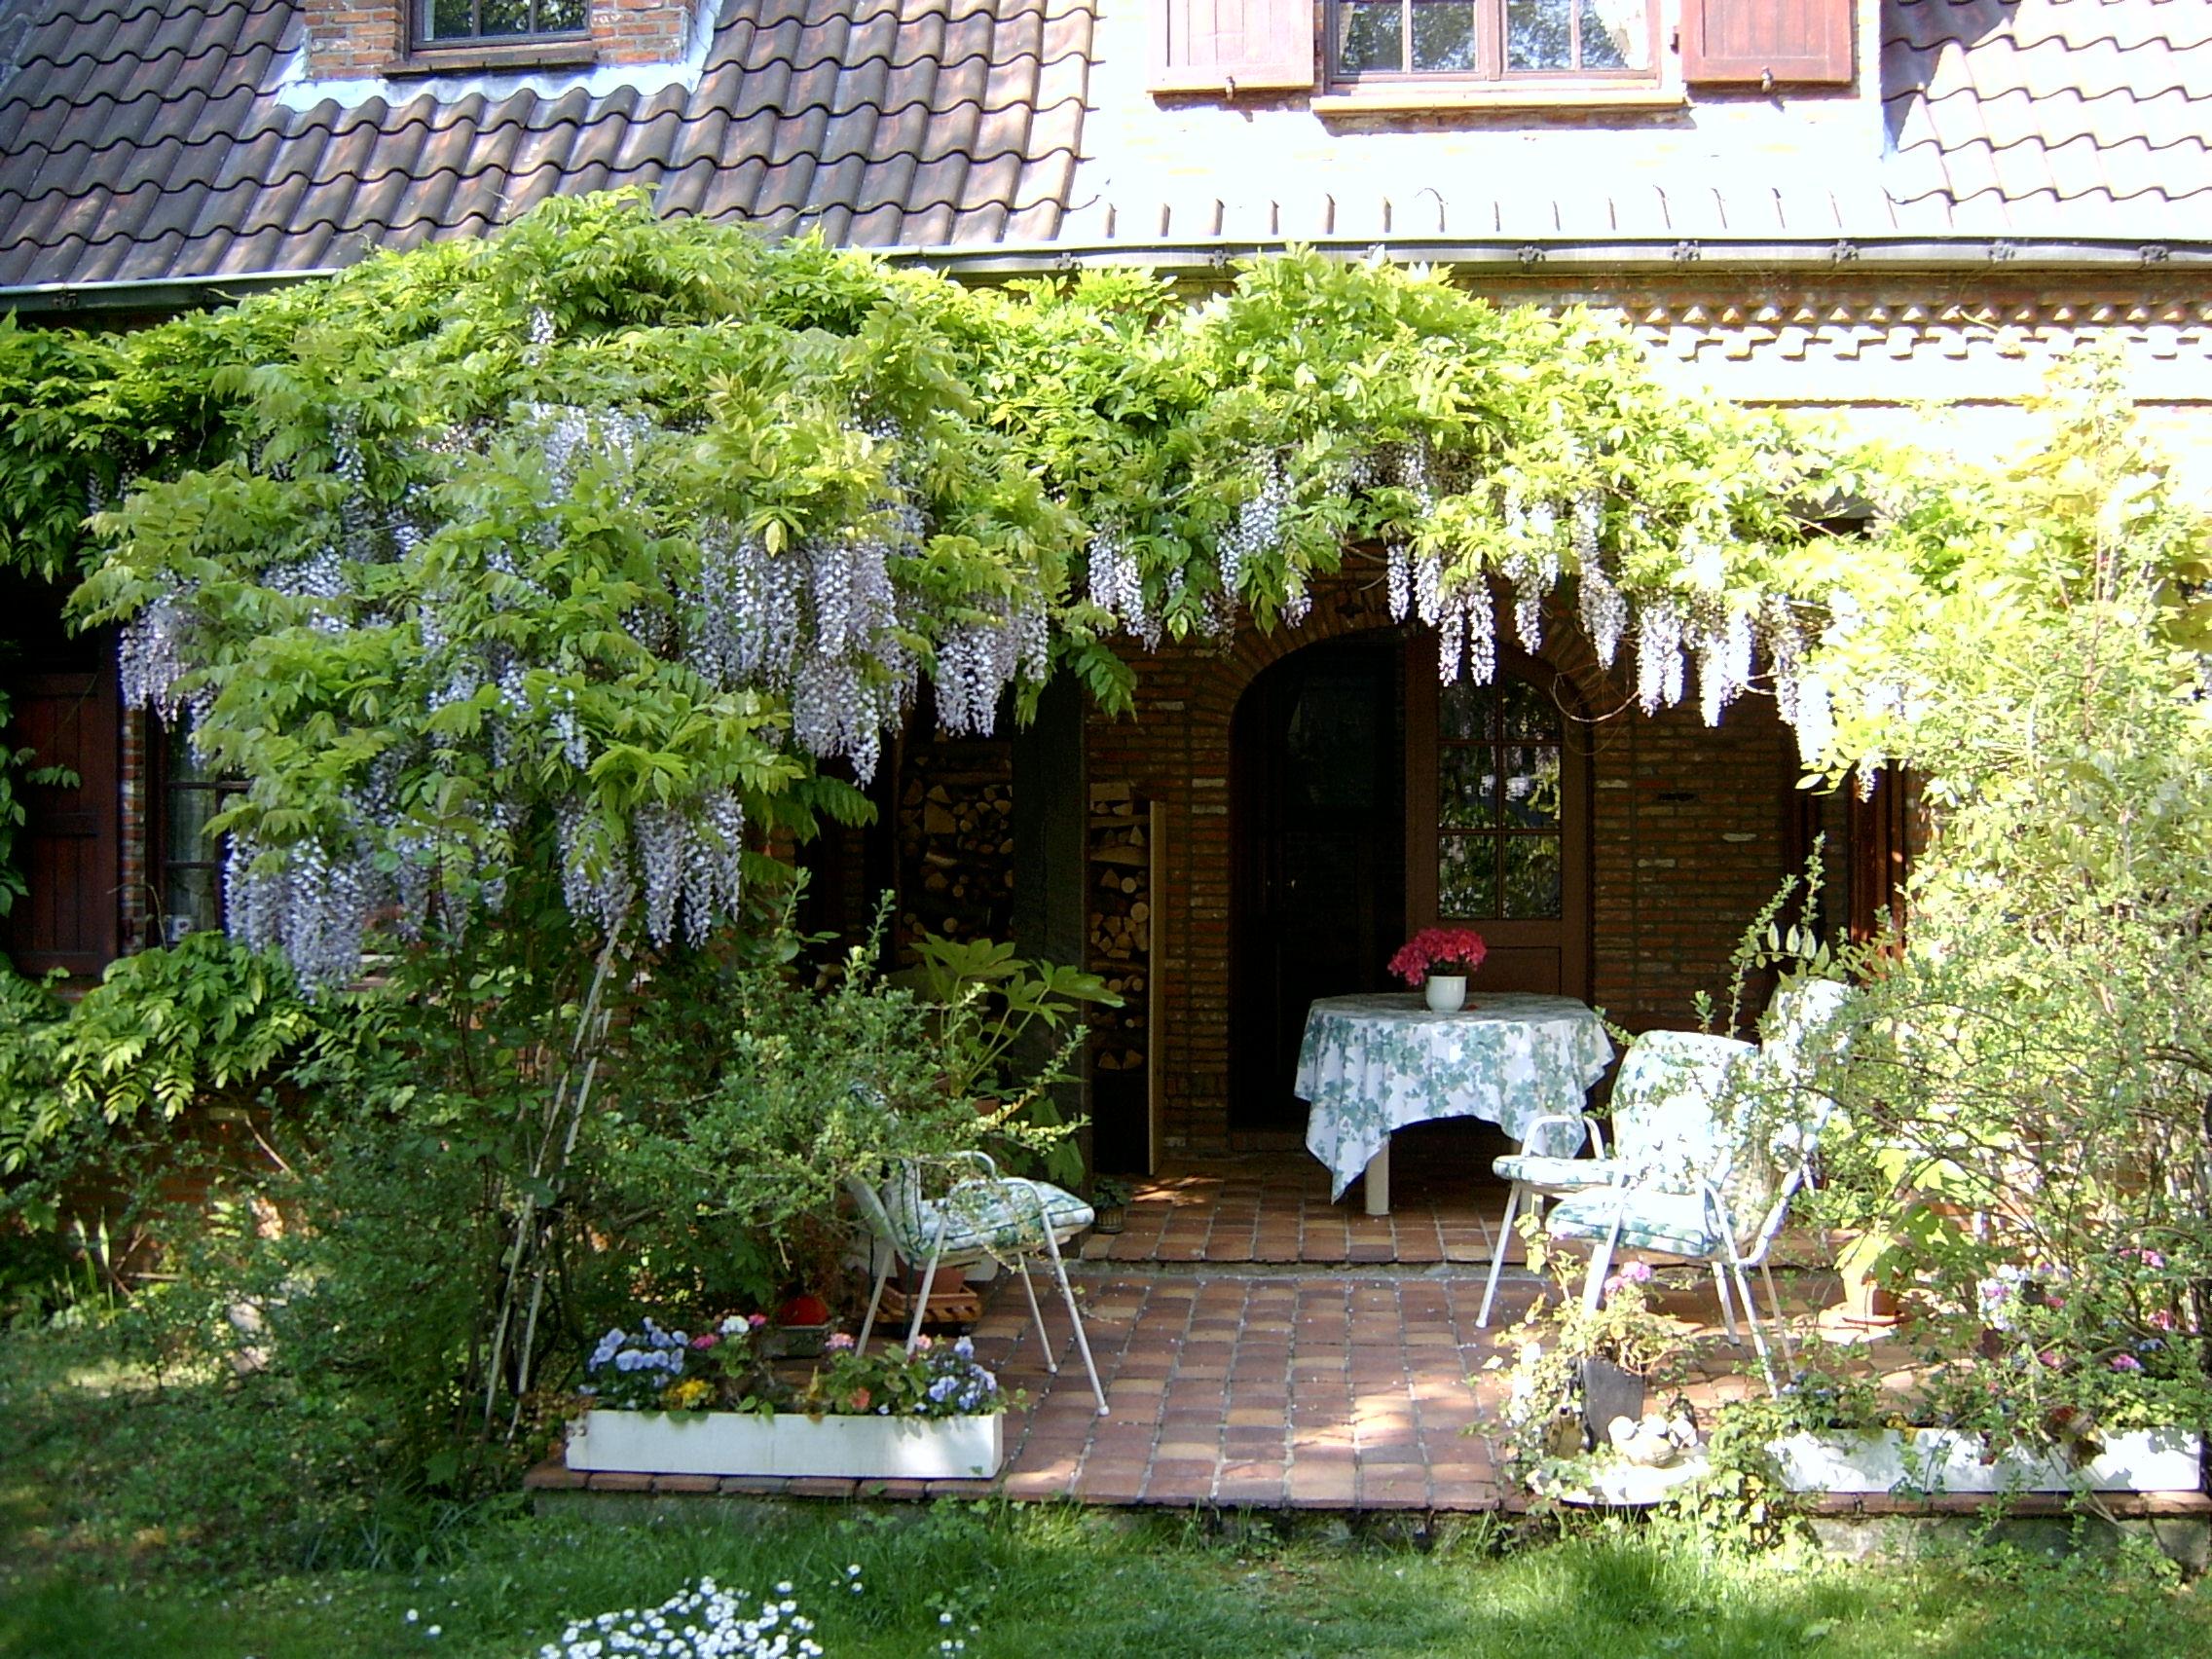 Ferienhaus B & B für Familien (2420981), Wezembeek-Oppem, Flämisch Brabant, Flandern, Belgien, Bild 8